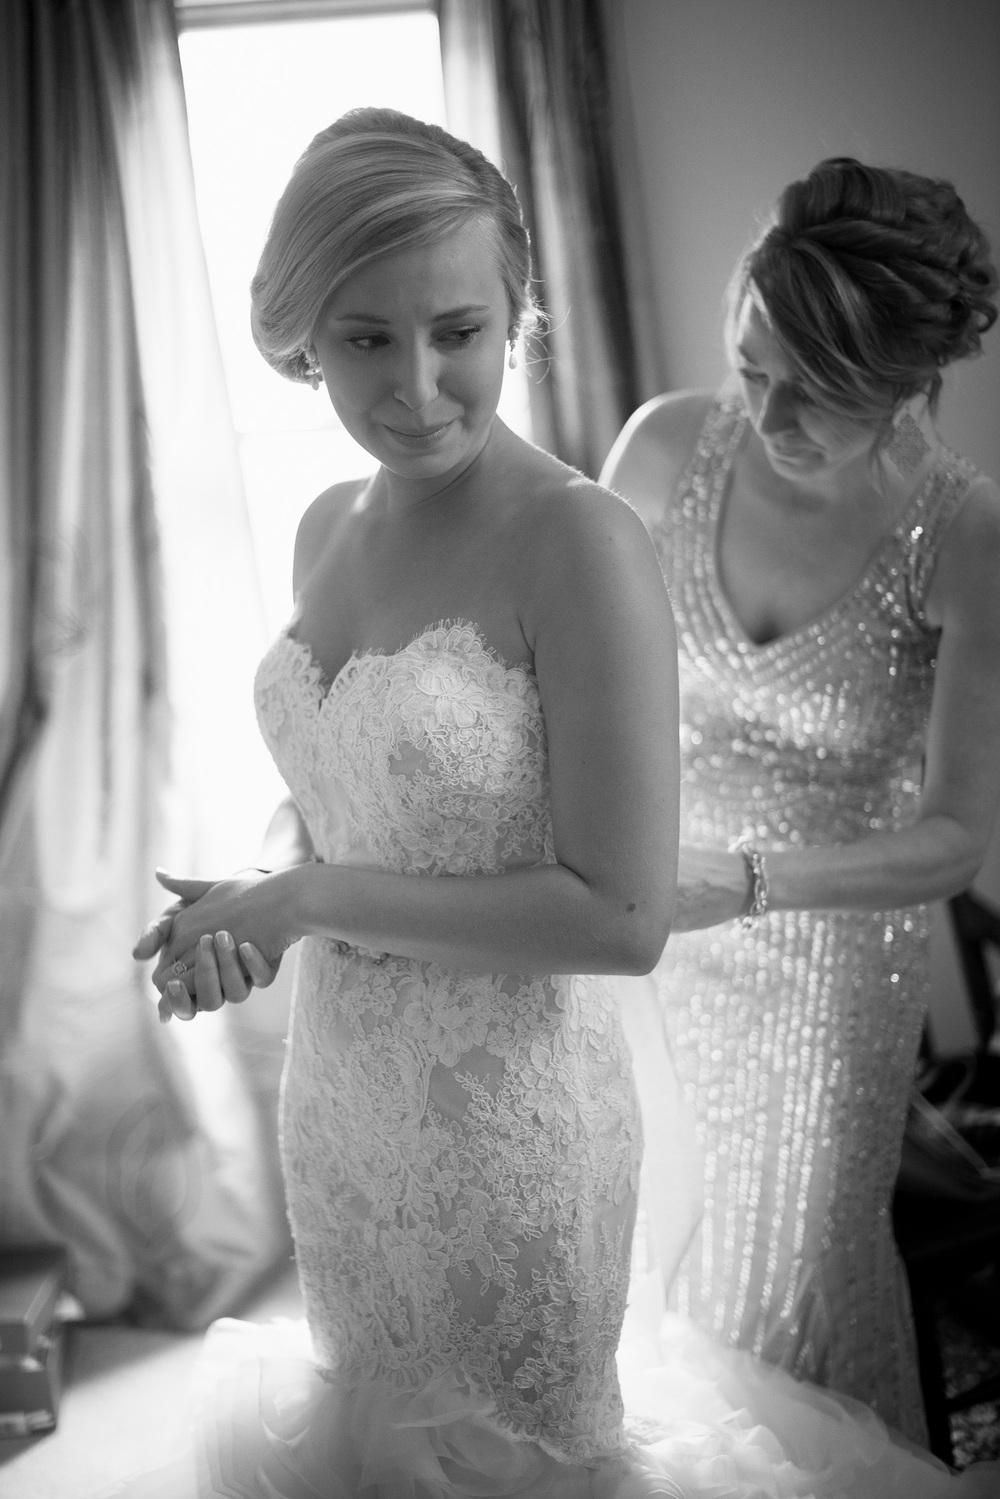 bride mother daughter tears dress window light